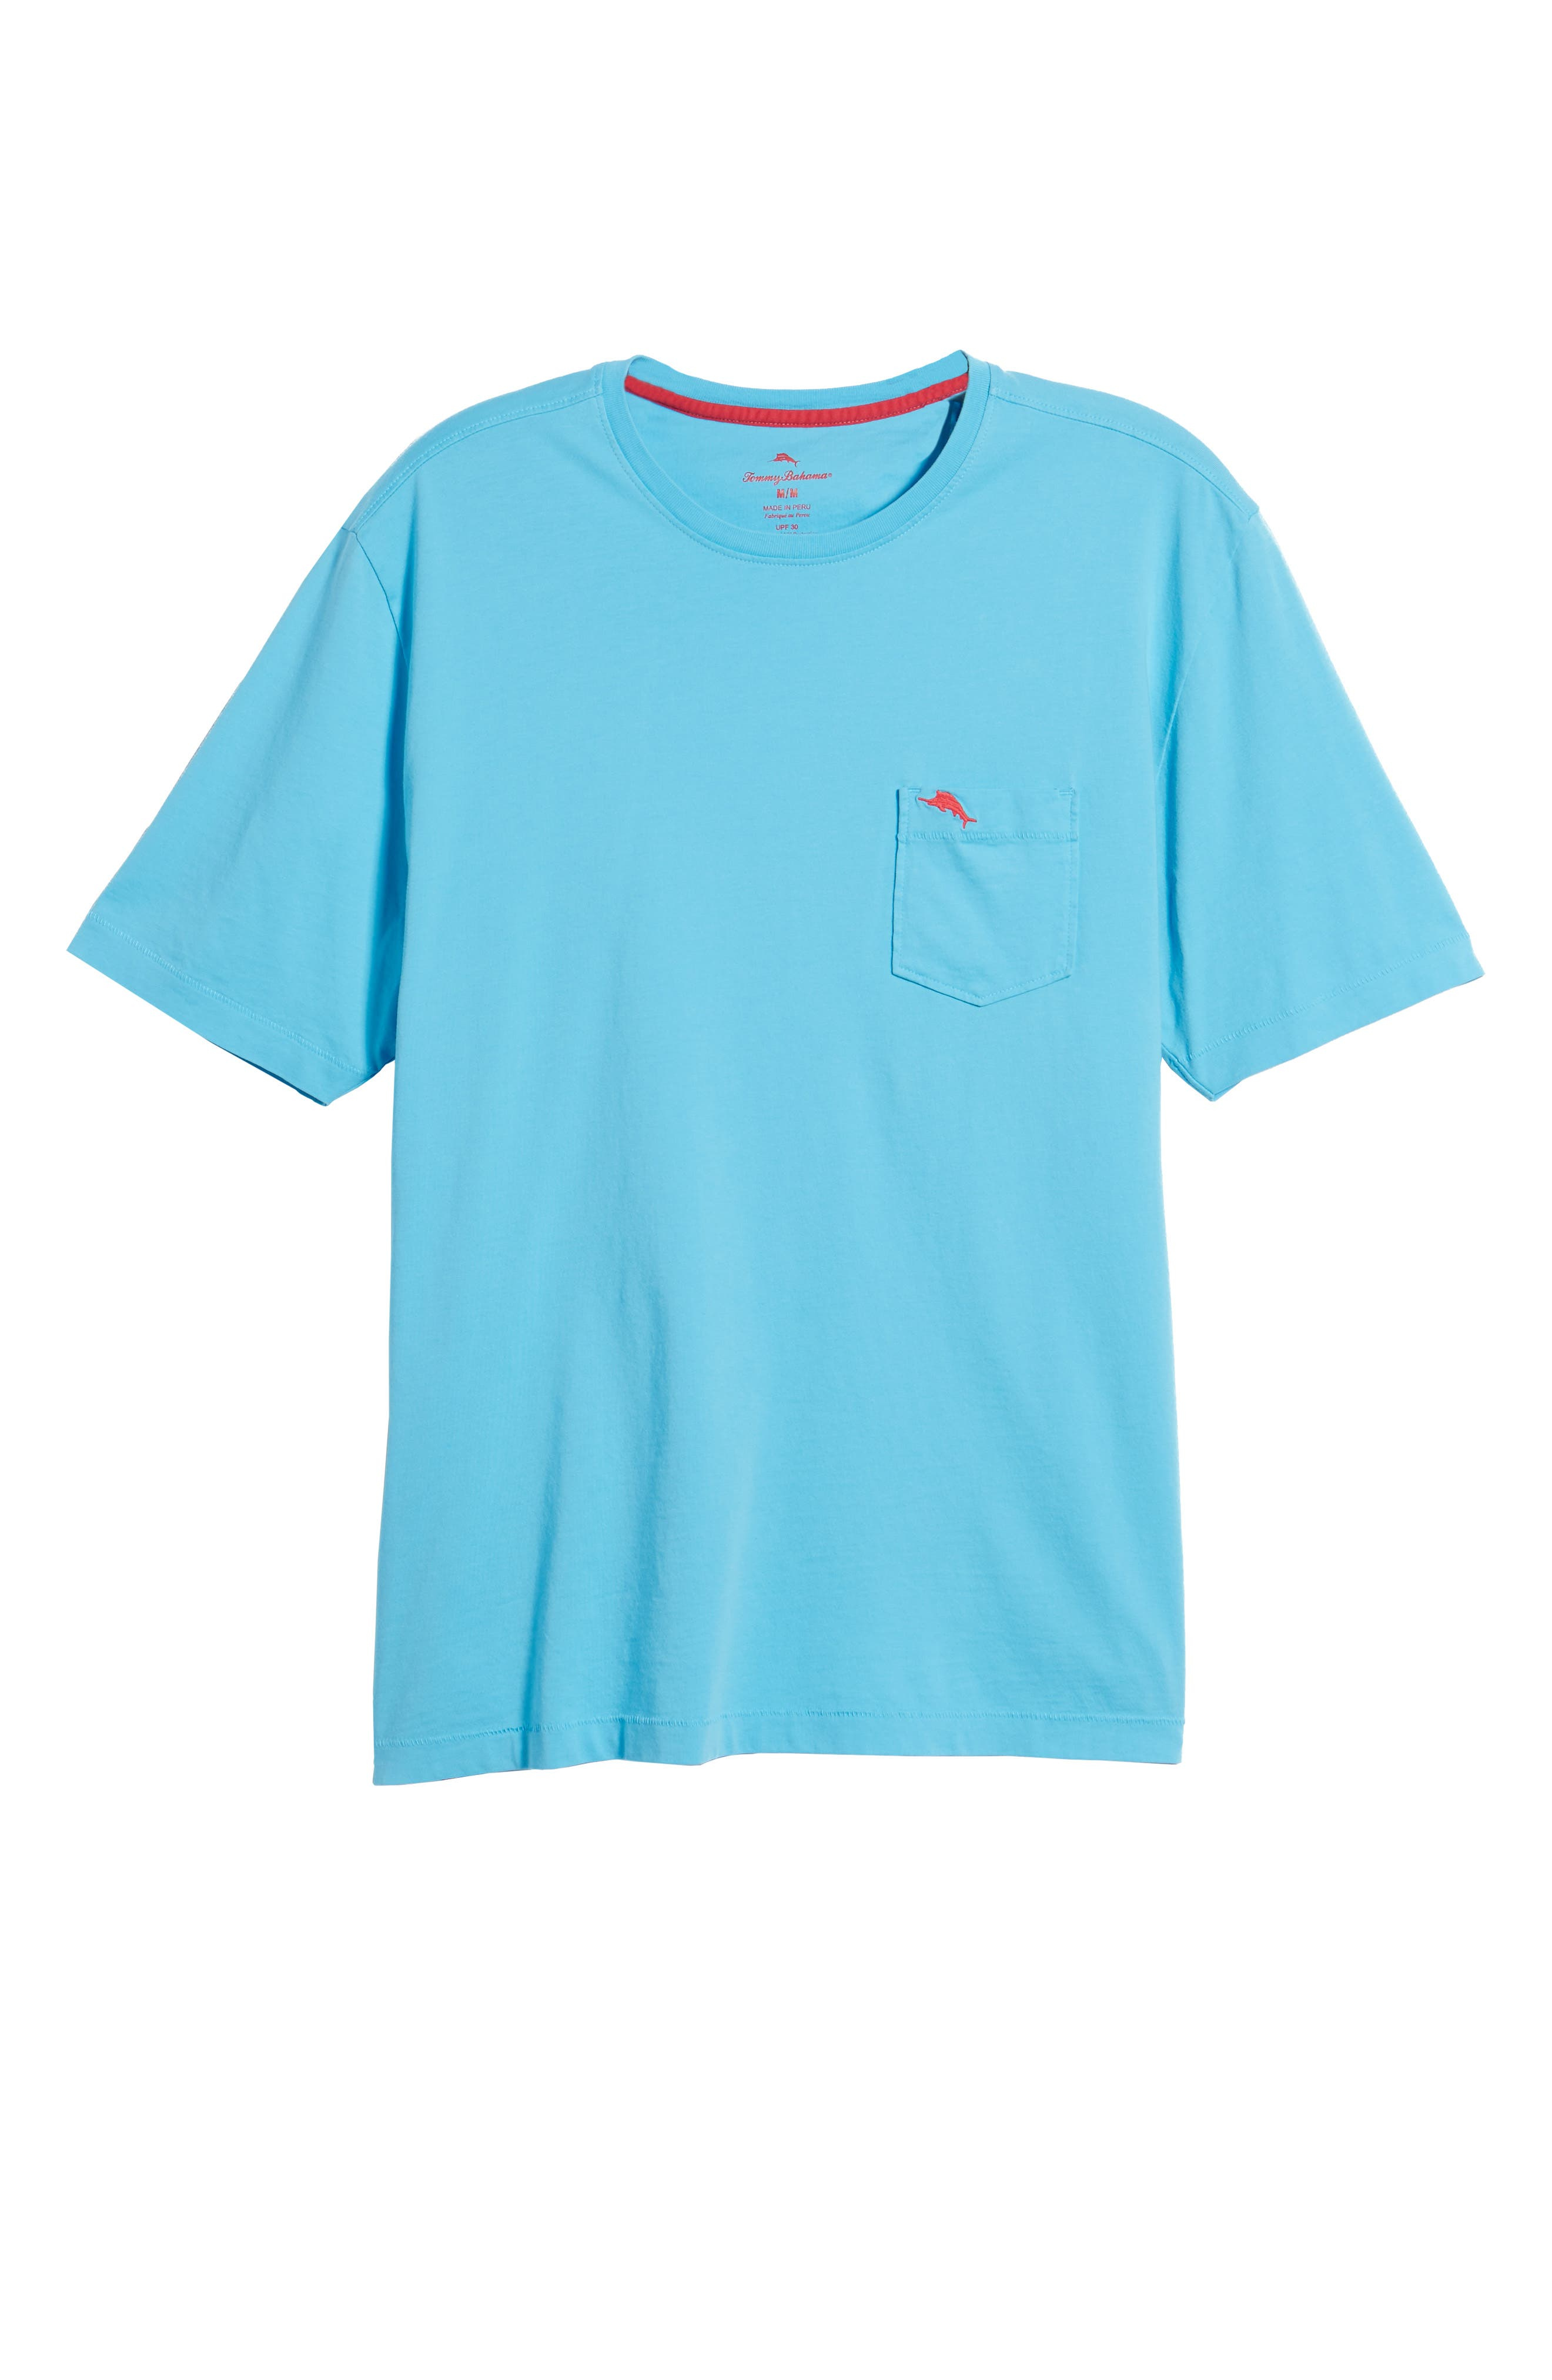 Bali Skyline T-Shirt,                             Alternate thumbnail 6, color,                             Breeze Blue